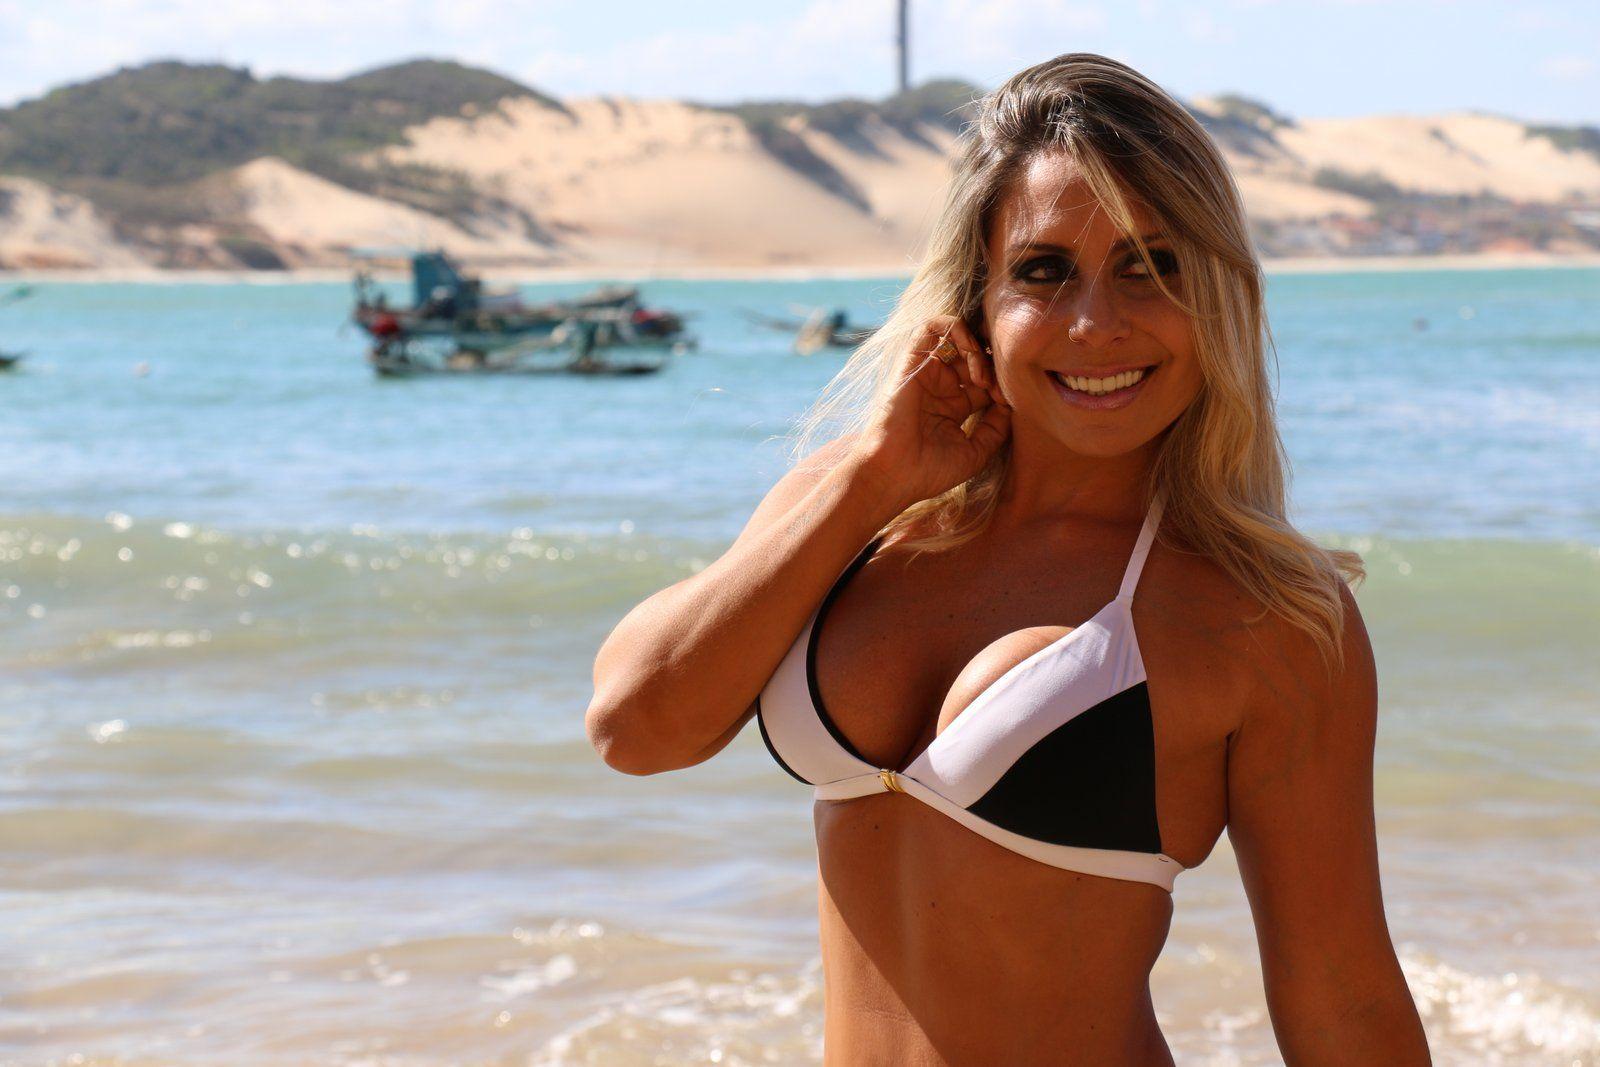 Fotos Gabriela Bayerlein nudes (83 photo), Ass, Cleavage, Selfie, lingerie 2020